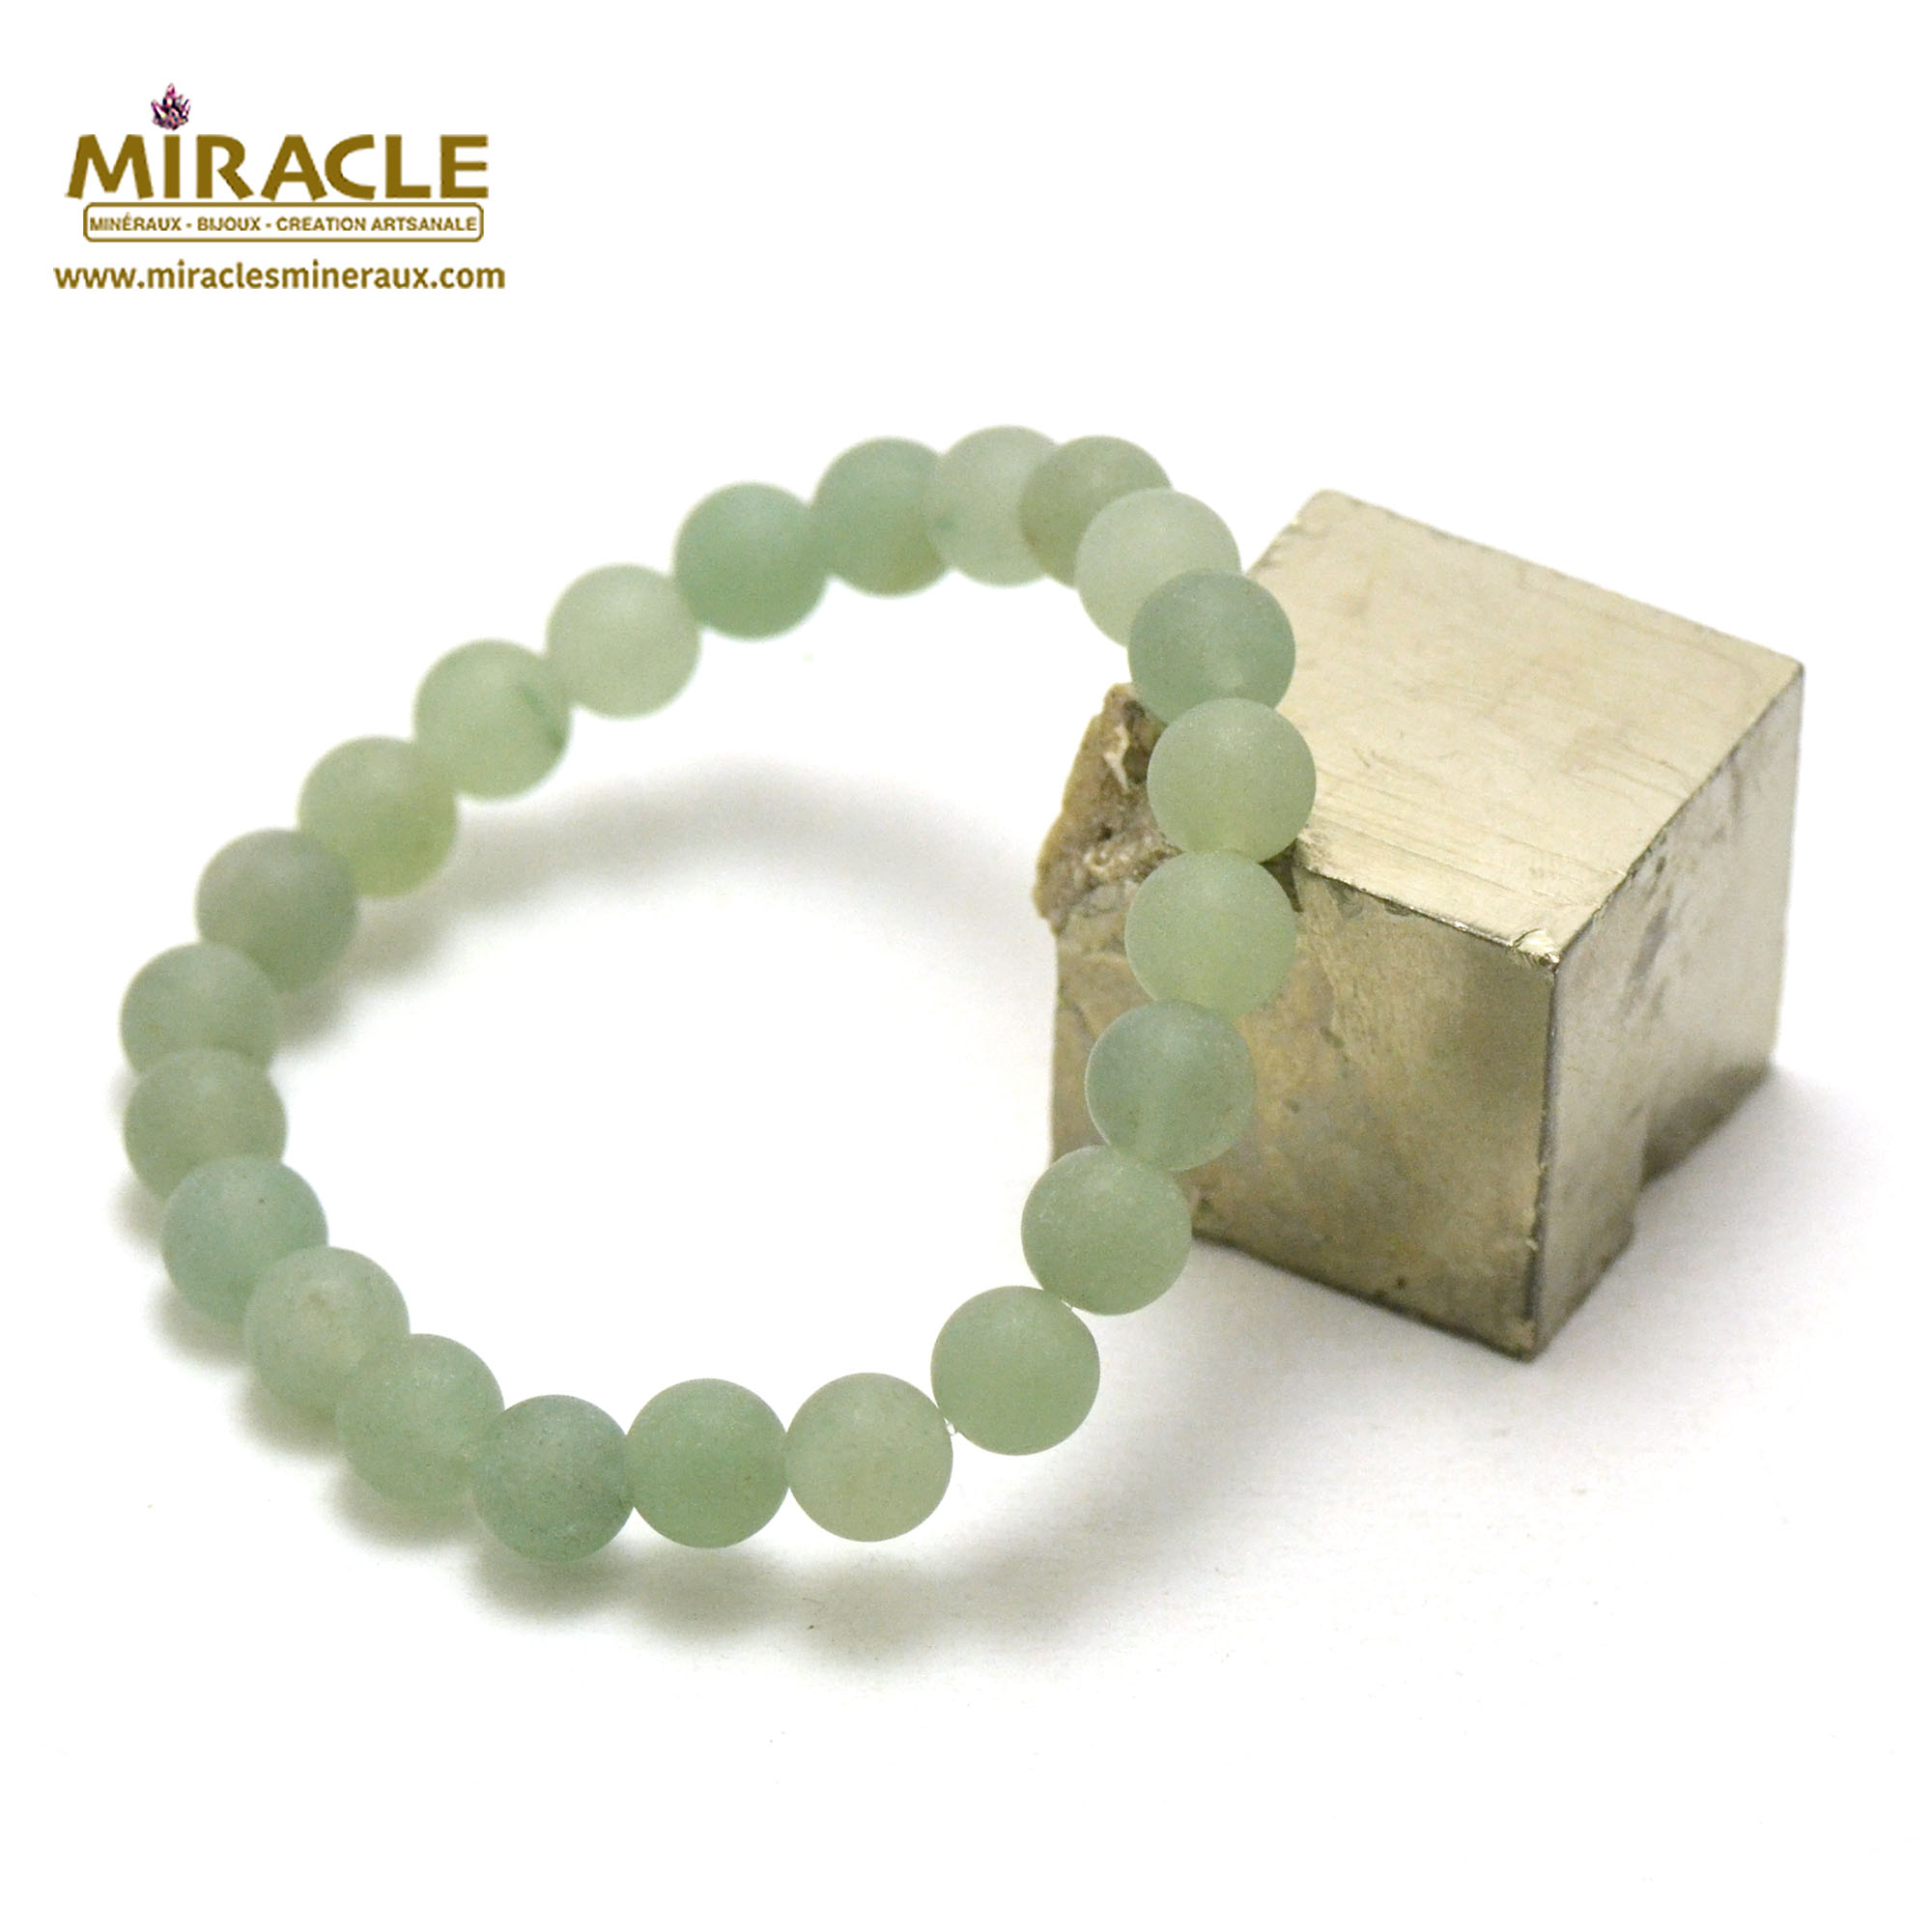 bracelet aventurine givré  perle mat ronde 8 mm